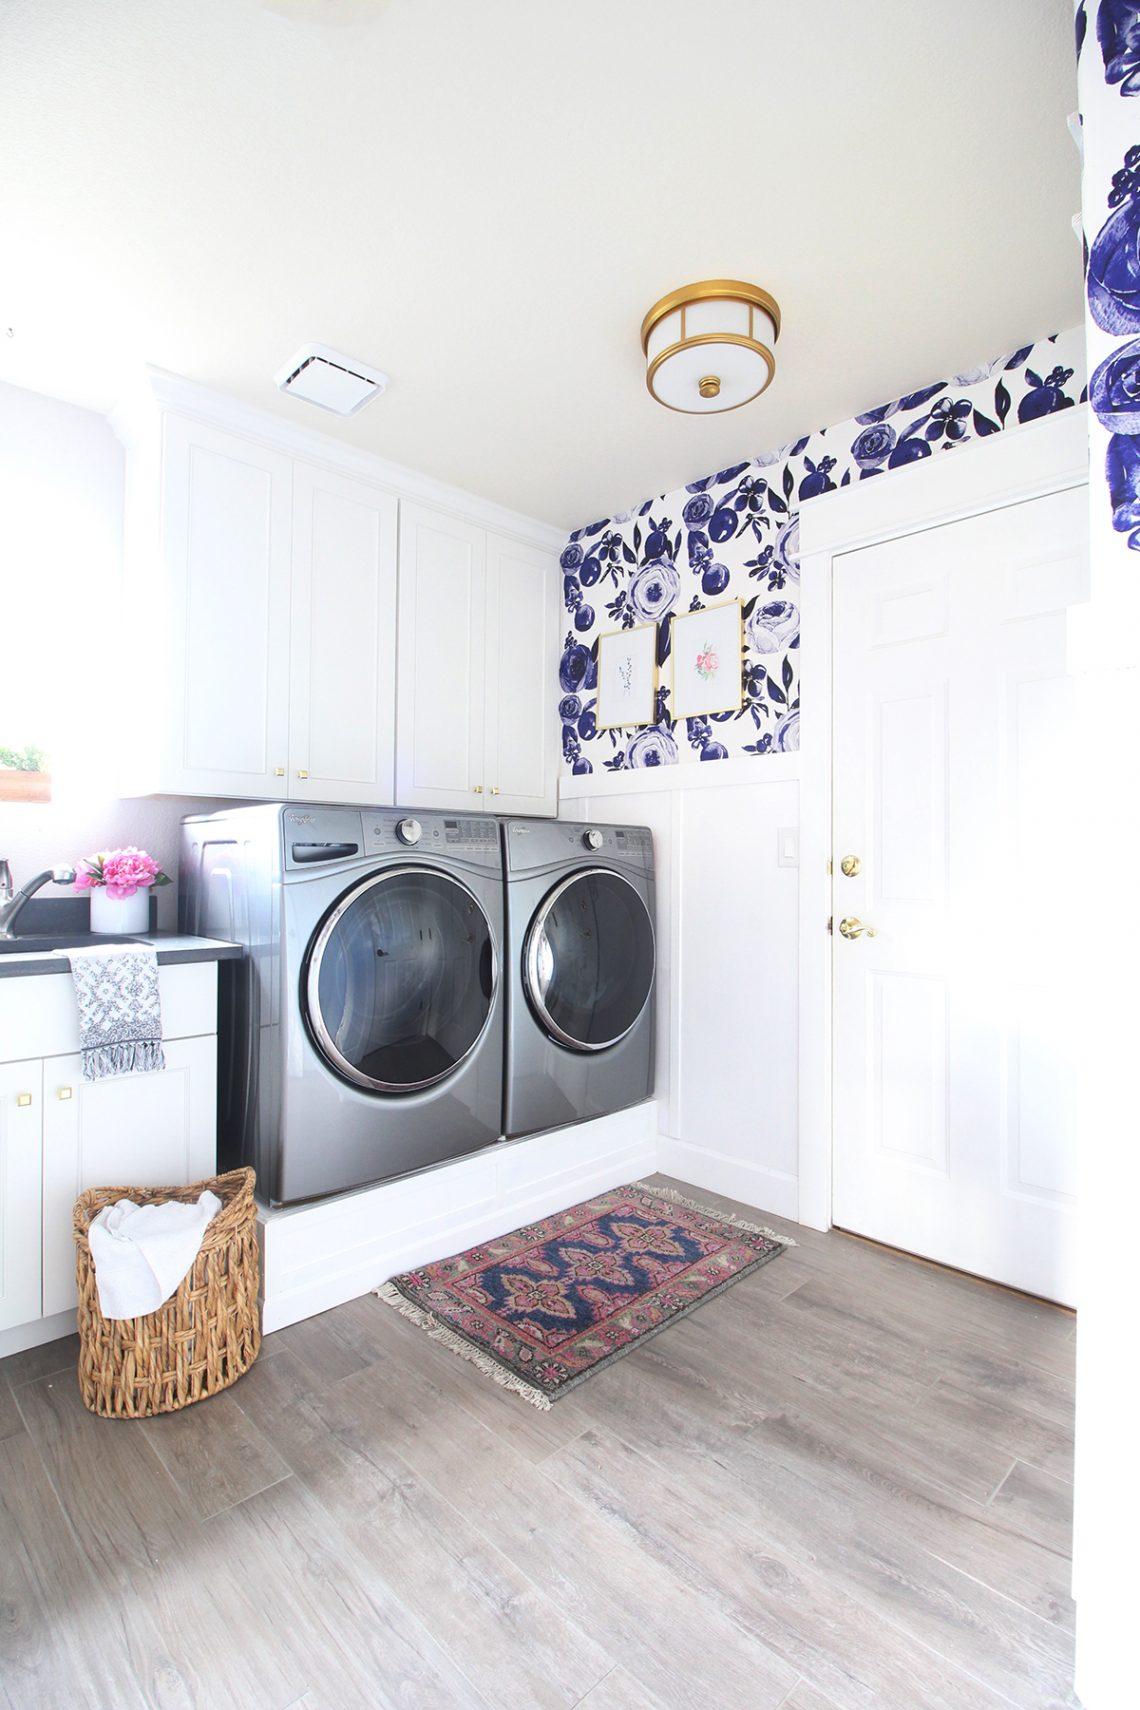 Park home reno diy laundry pedestal classy clutter park home reno diy laundry pedestal solutioingenieria Choice Image